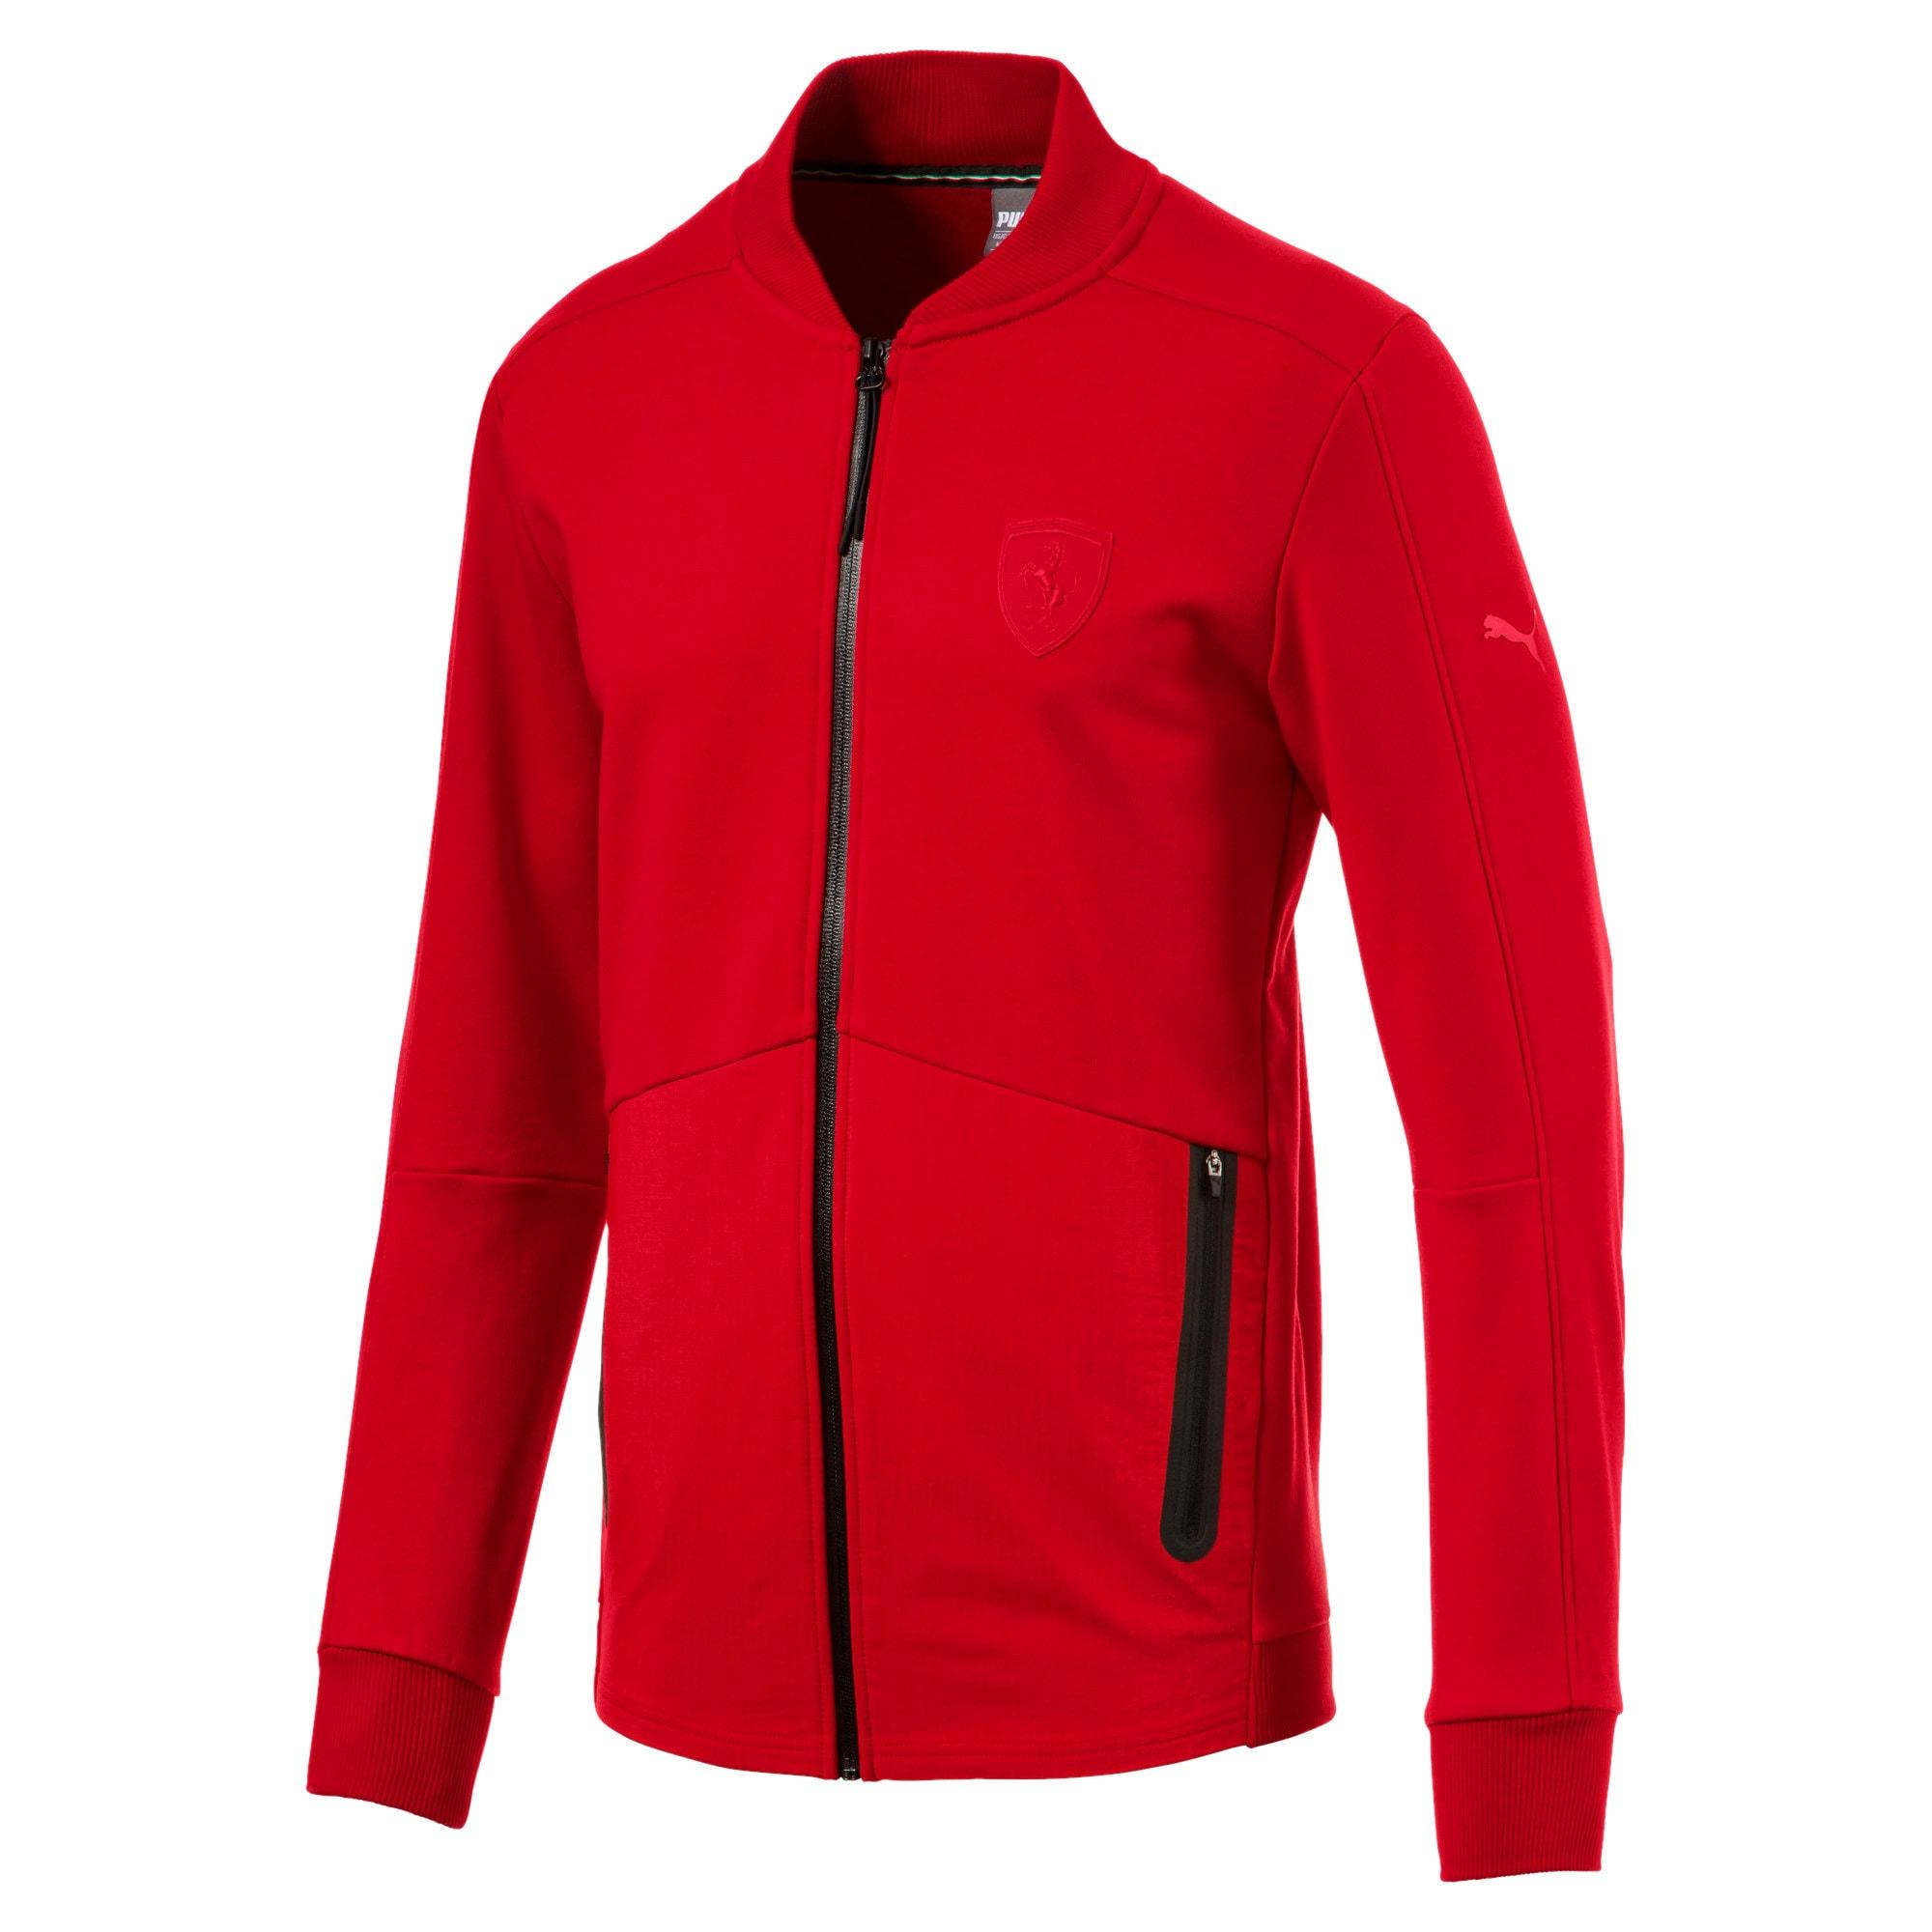 Thumbnail 1 of Ferrari Lifestyle Men's Sweat Jacket, Rosso Corsa, medium-IND